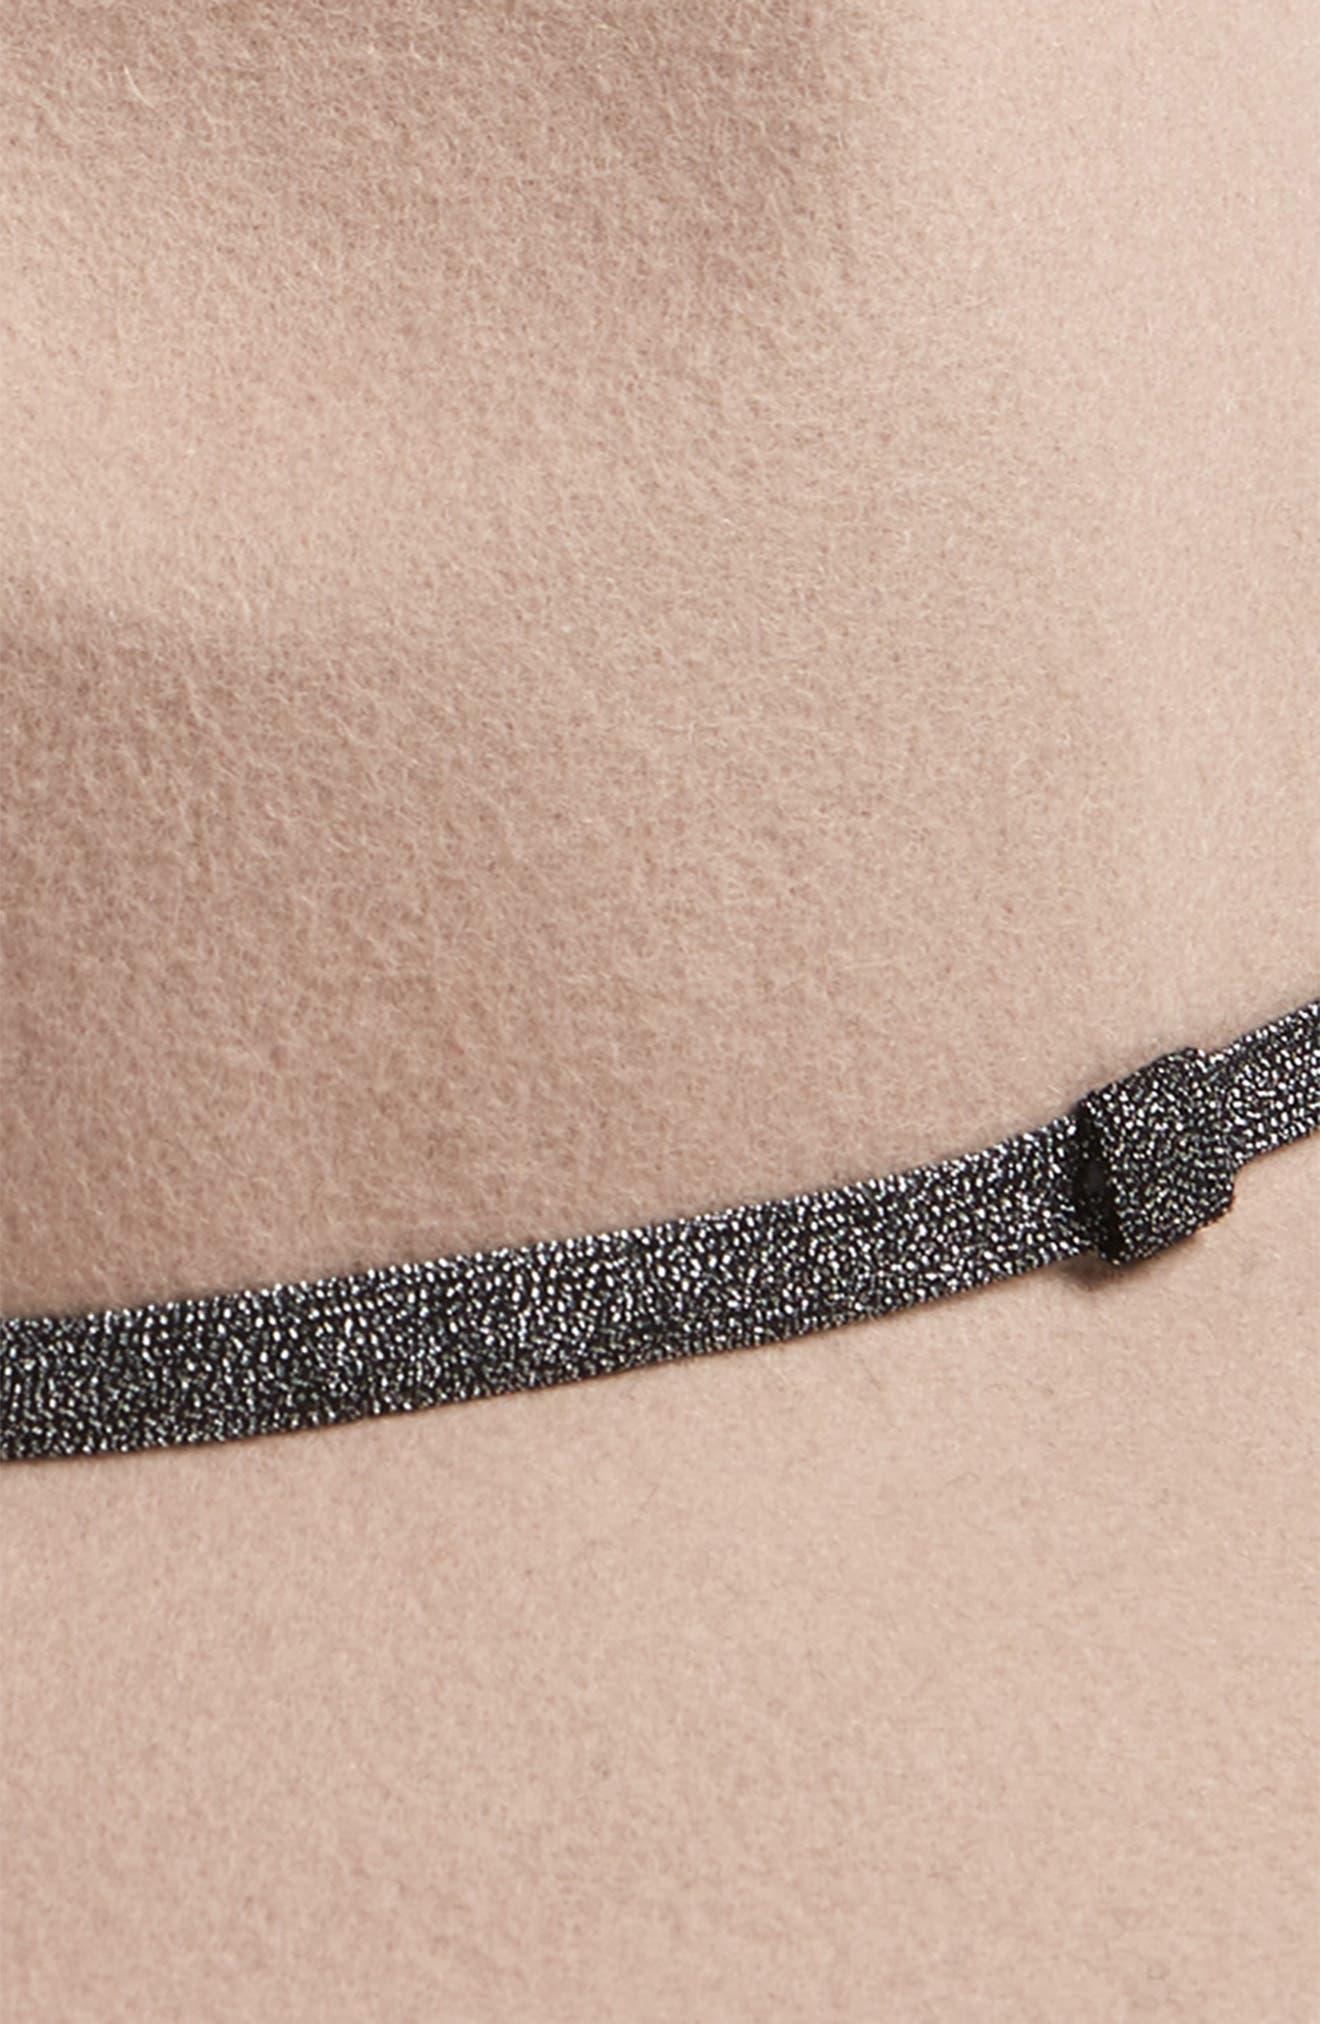 TREASURE & BOND, Metallic Band Wool Felt Panama Hat, Alternate thumbnail 2, color, 630